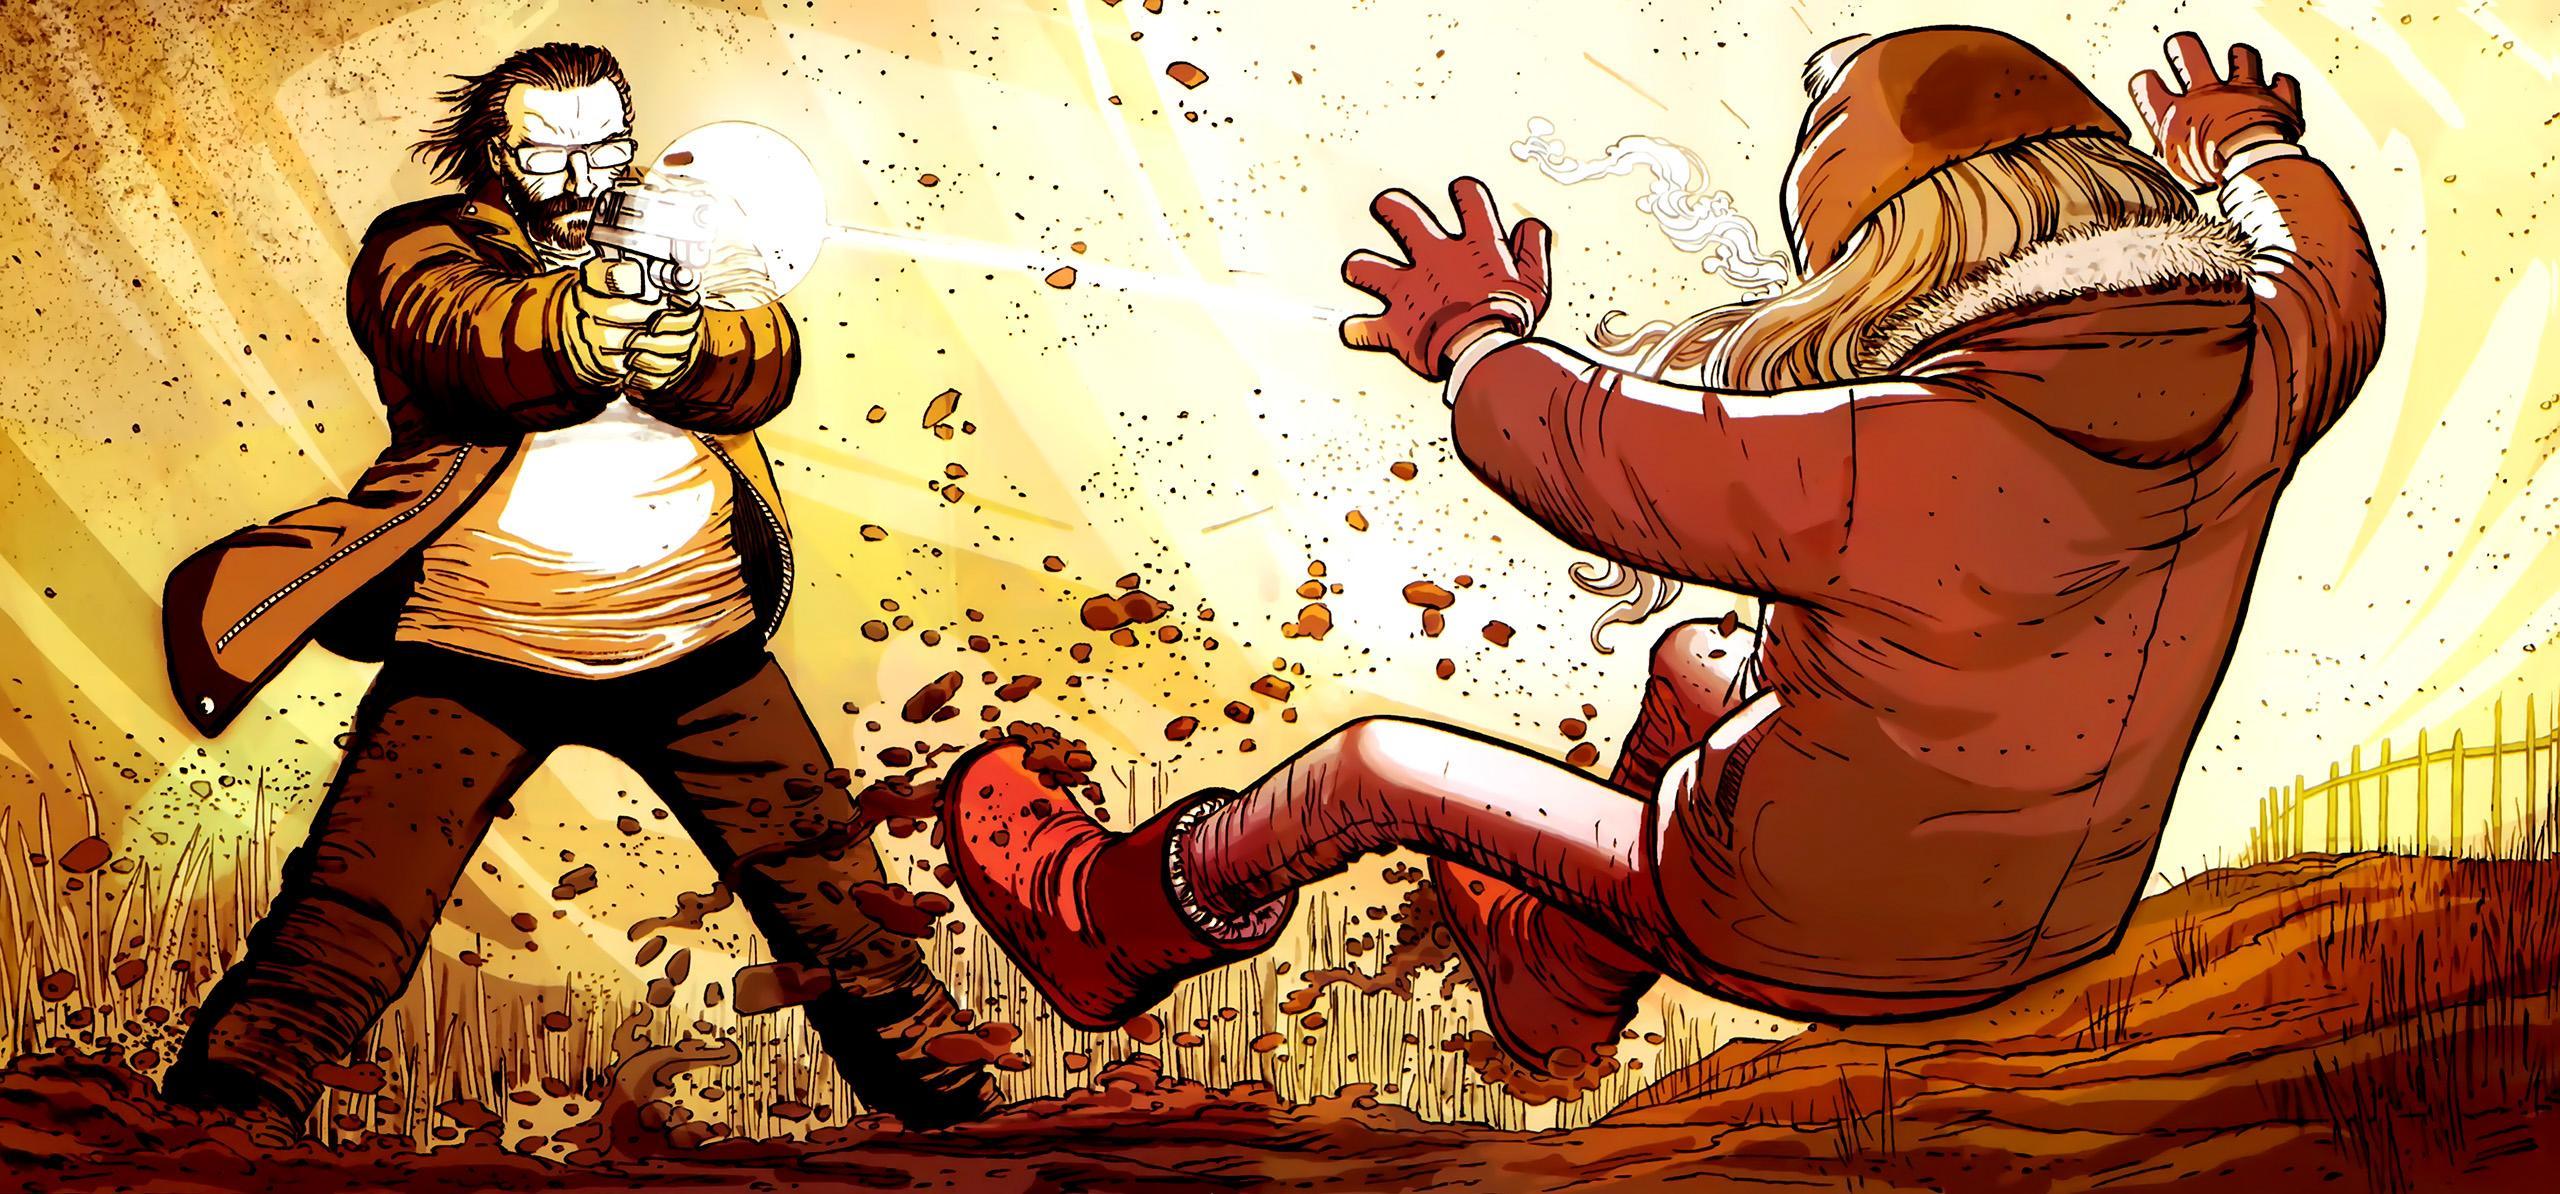 Movie - Kick-Ass  Superhero Comics Wallpaper